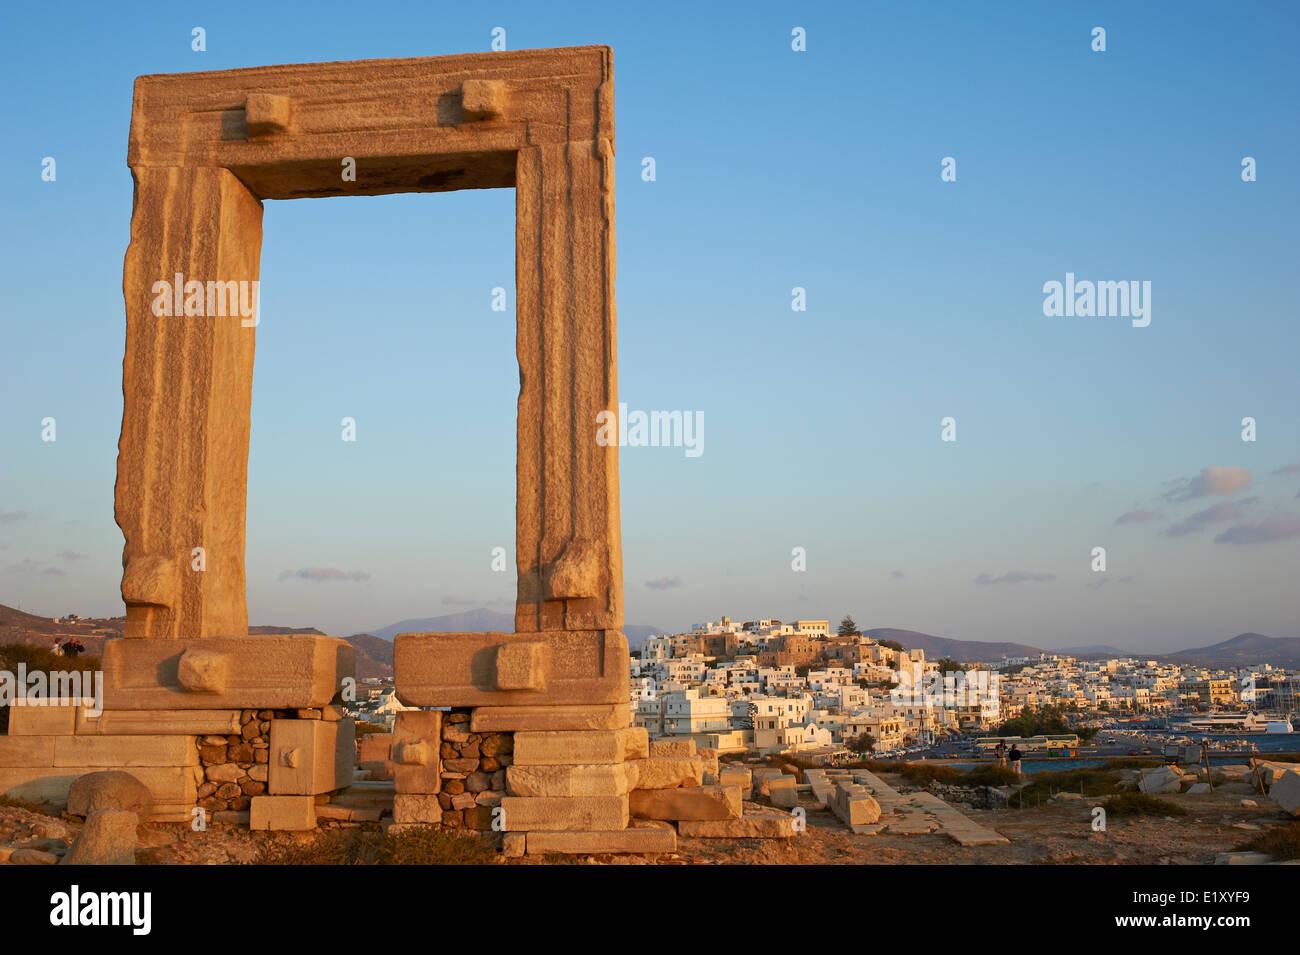 Greece, Cyclades islands, Naxos, city of Hora (Naxos), Portara Gateway of Apollon or Apollo temple - Stock Image